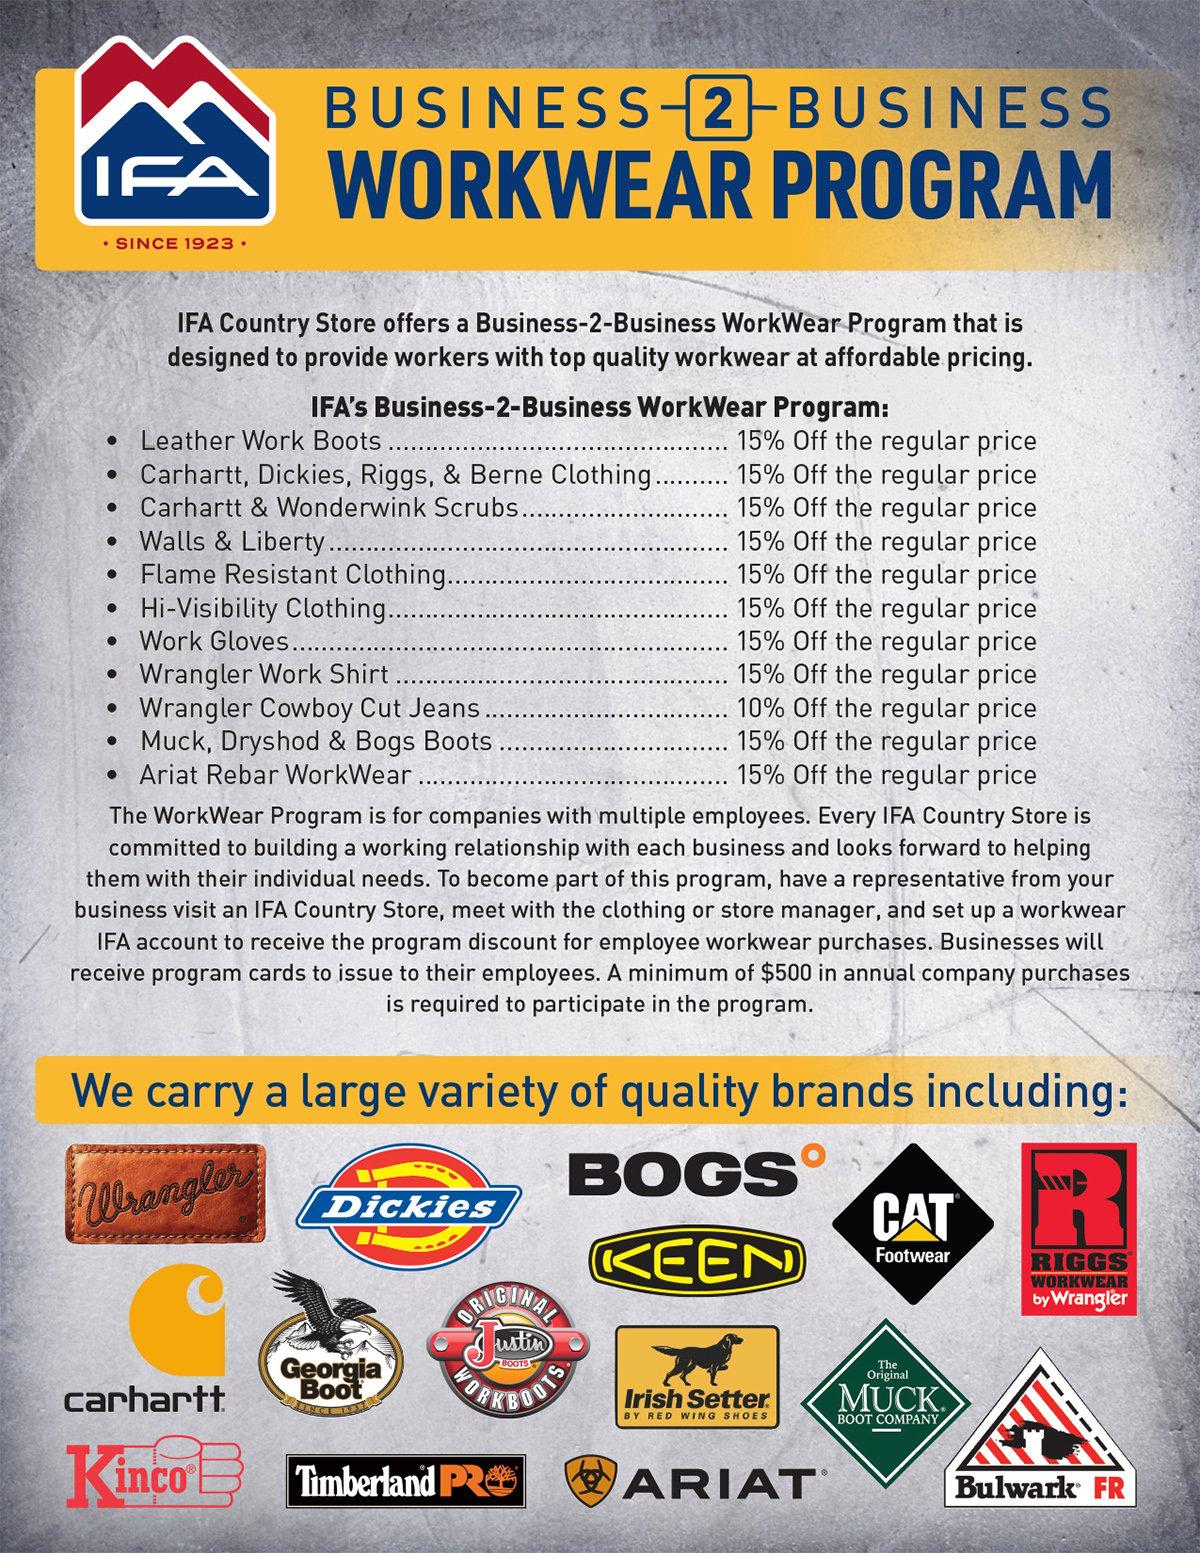 IFA's B2B Workwear program details and brands